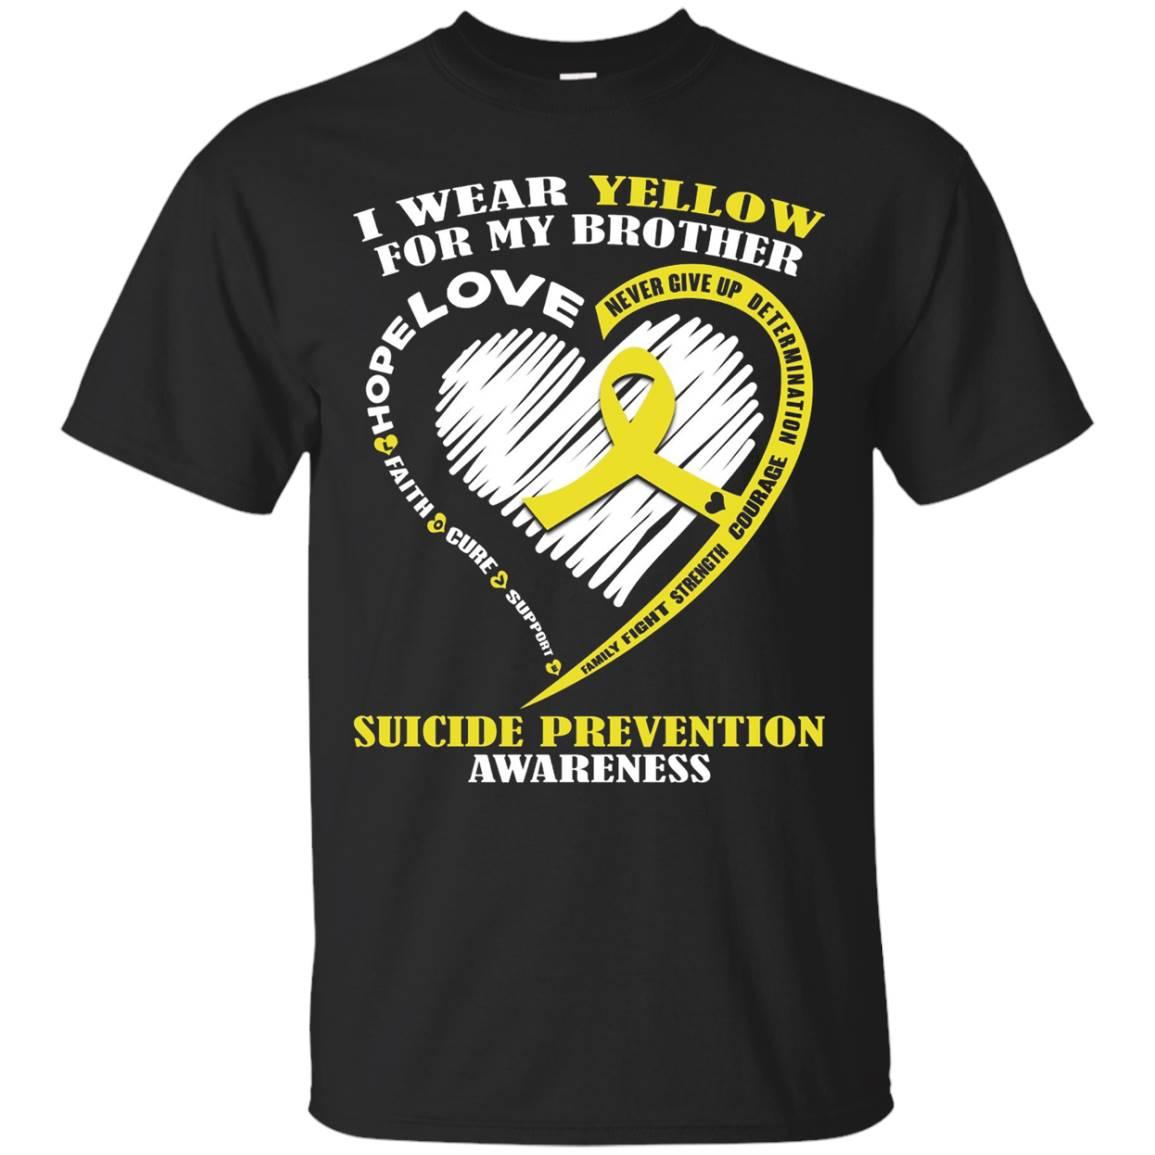 SeCrEt DeSiGn Suicide Prevention Awareness T-Shirt